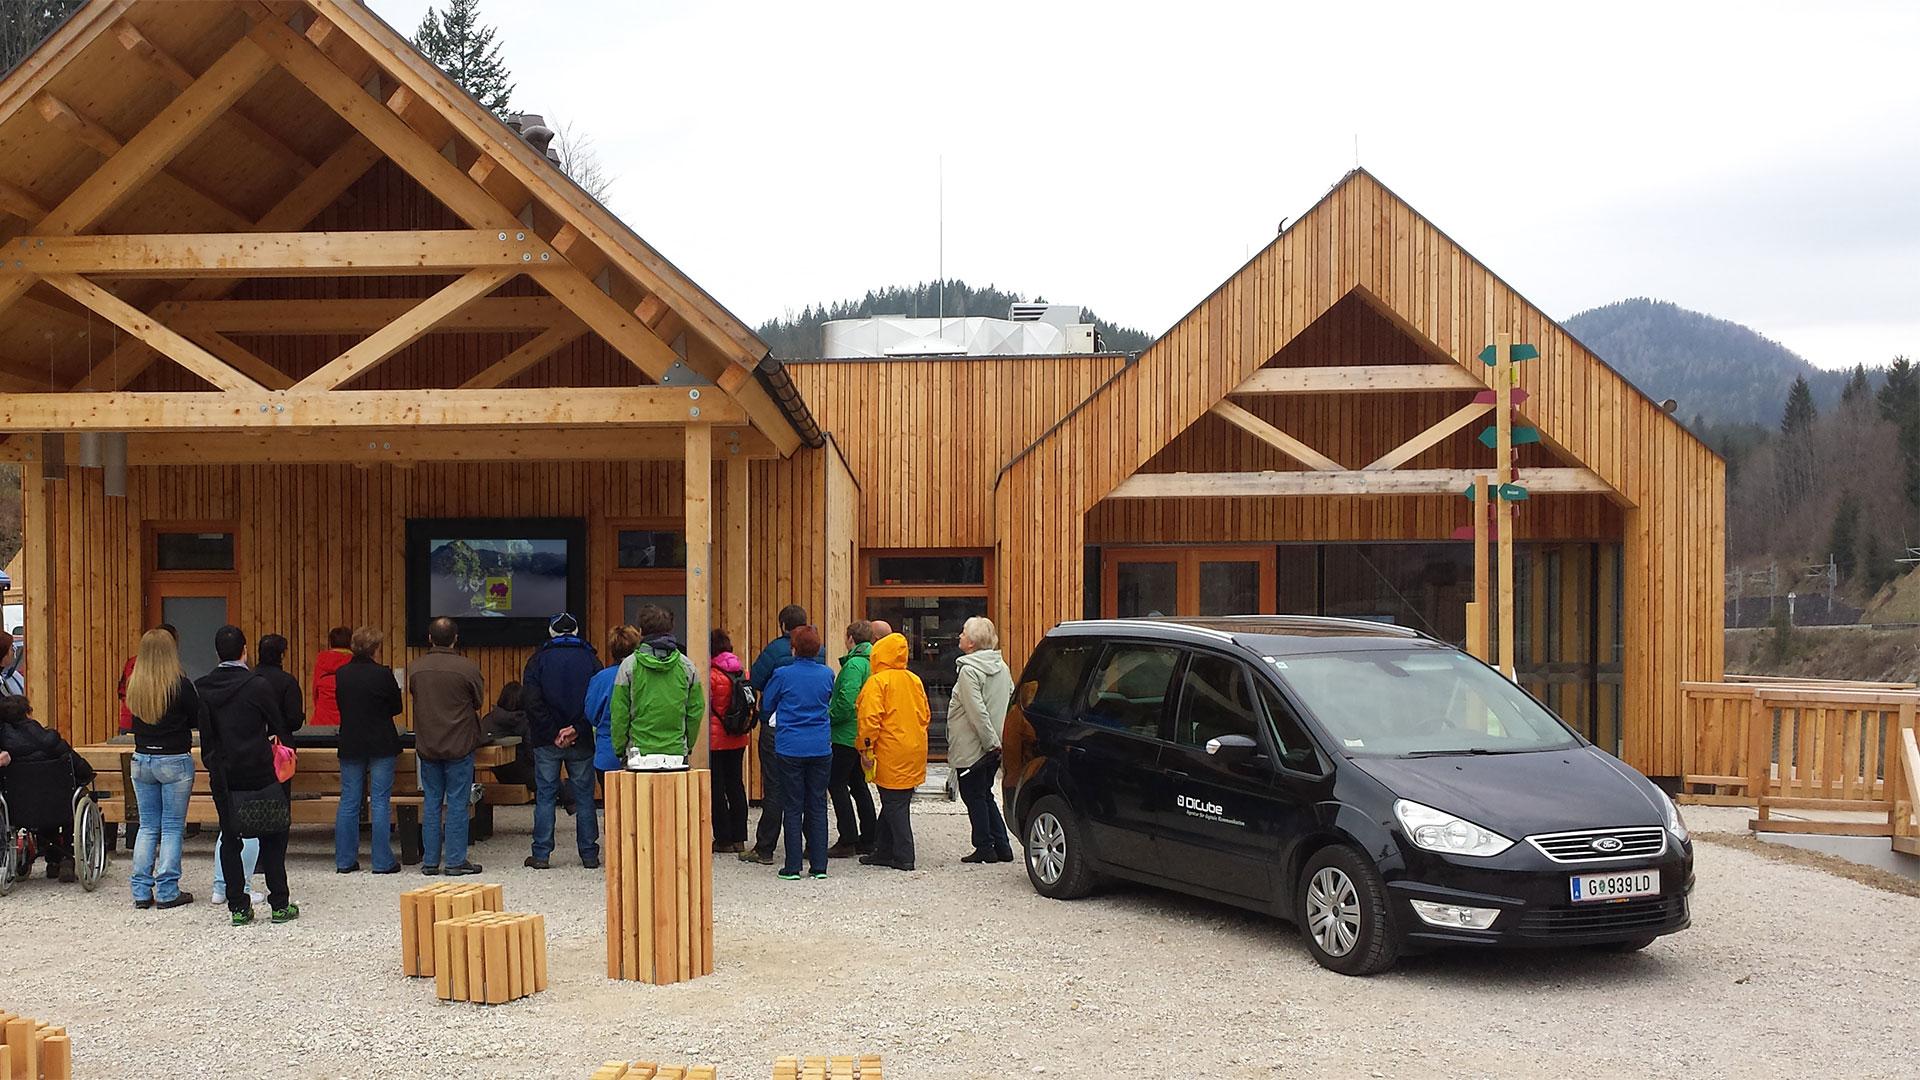 Naturpark Ötscher Outdoor